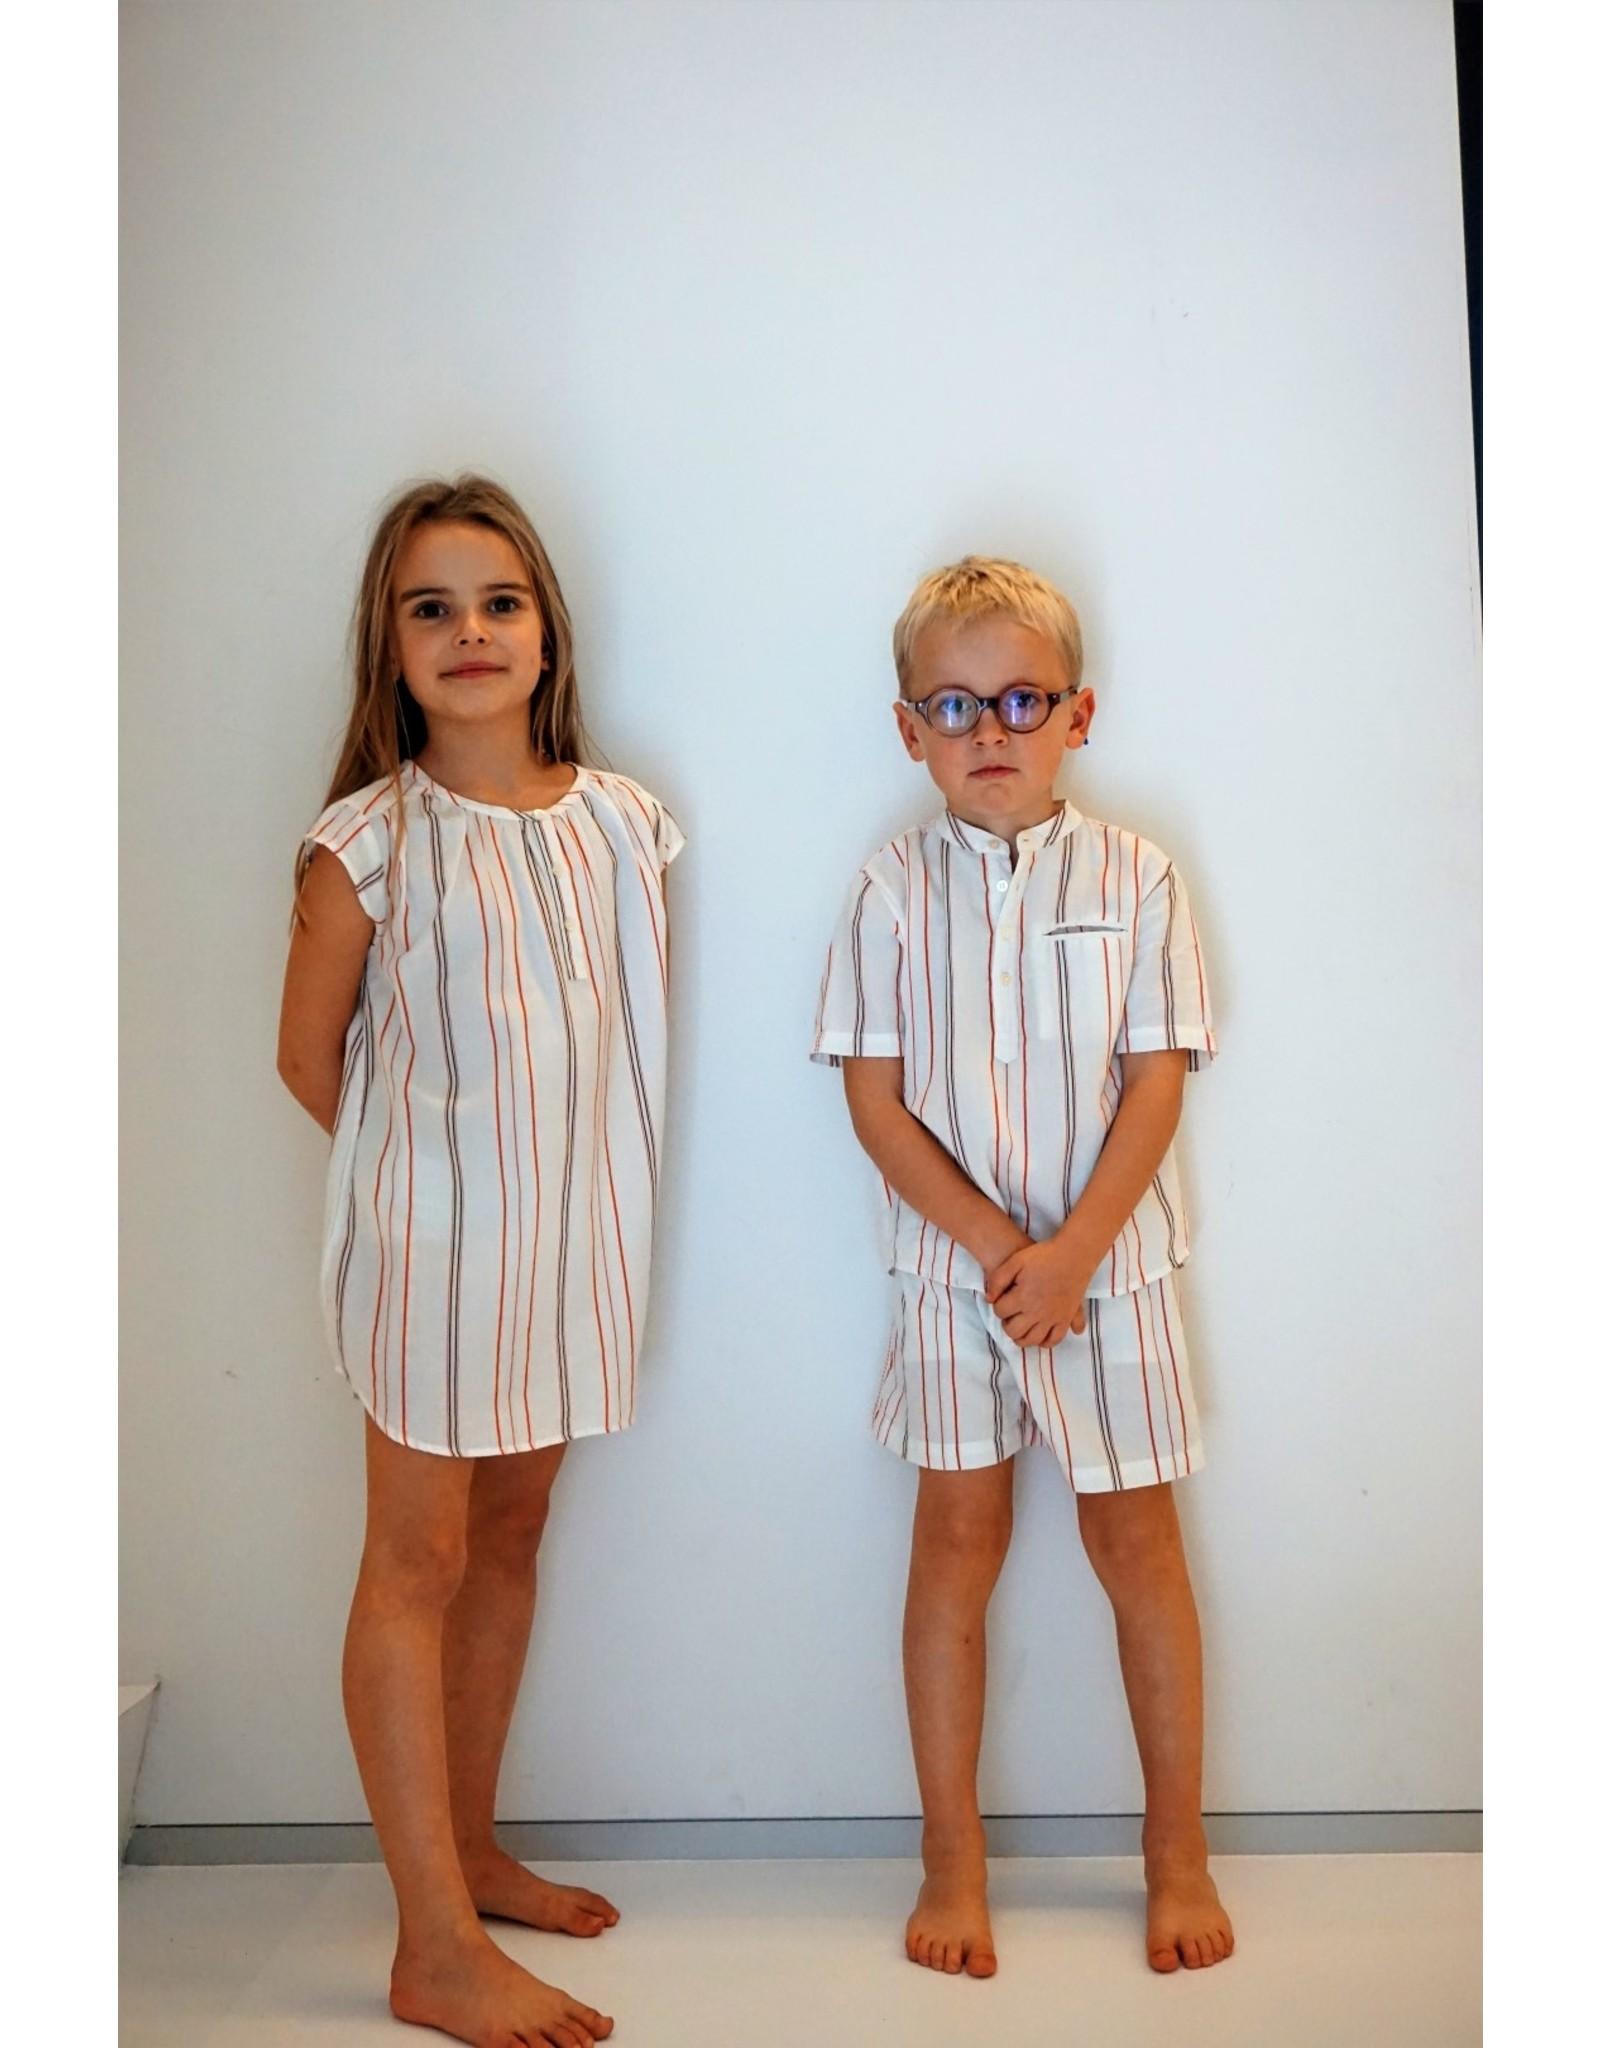 Dorélit Acamar & Mars | Pajama Set Woven | Chili